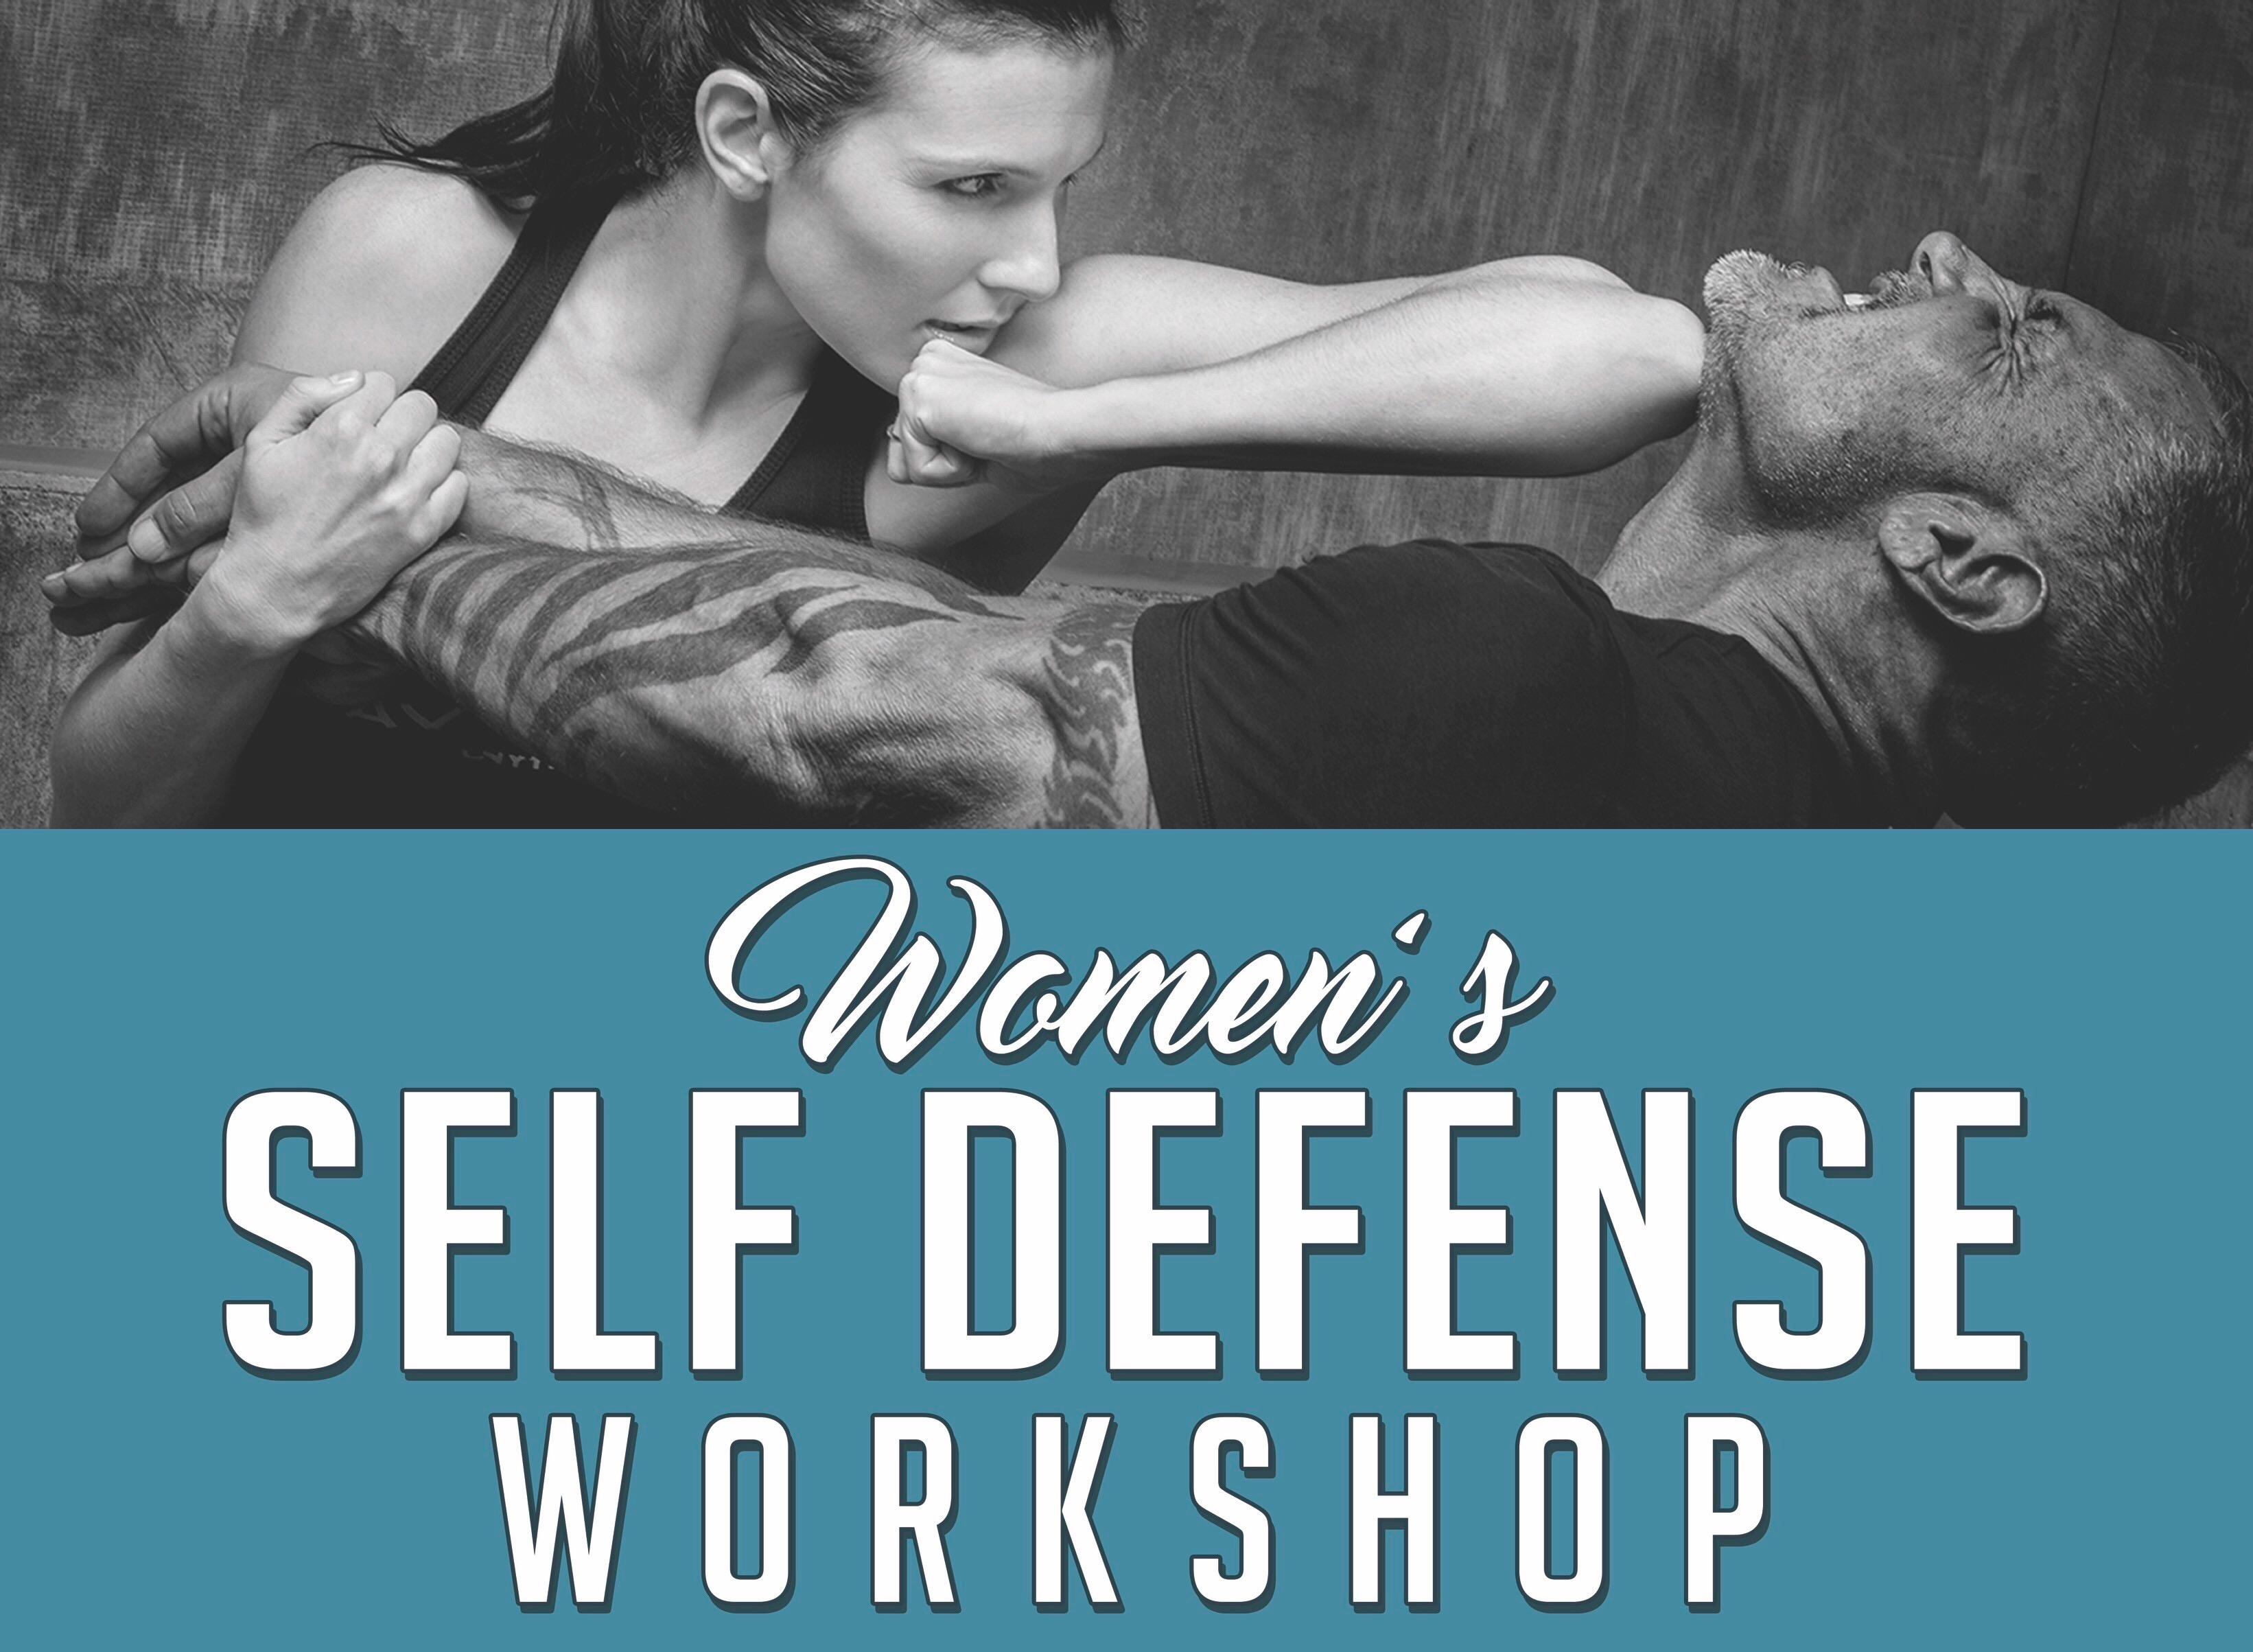 Women's Self Defense